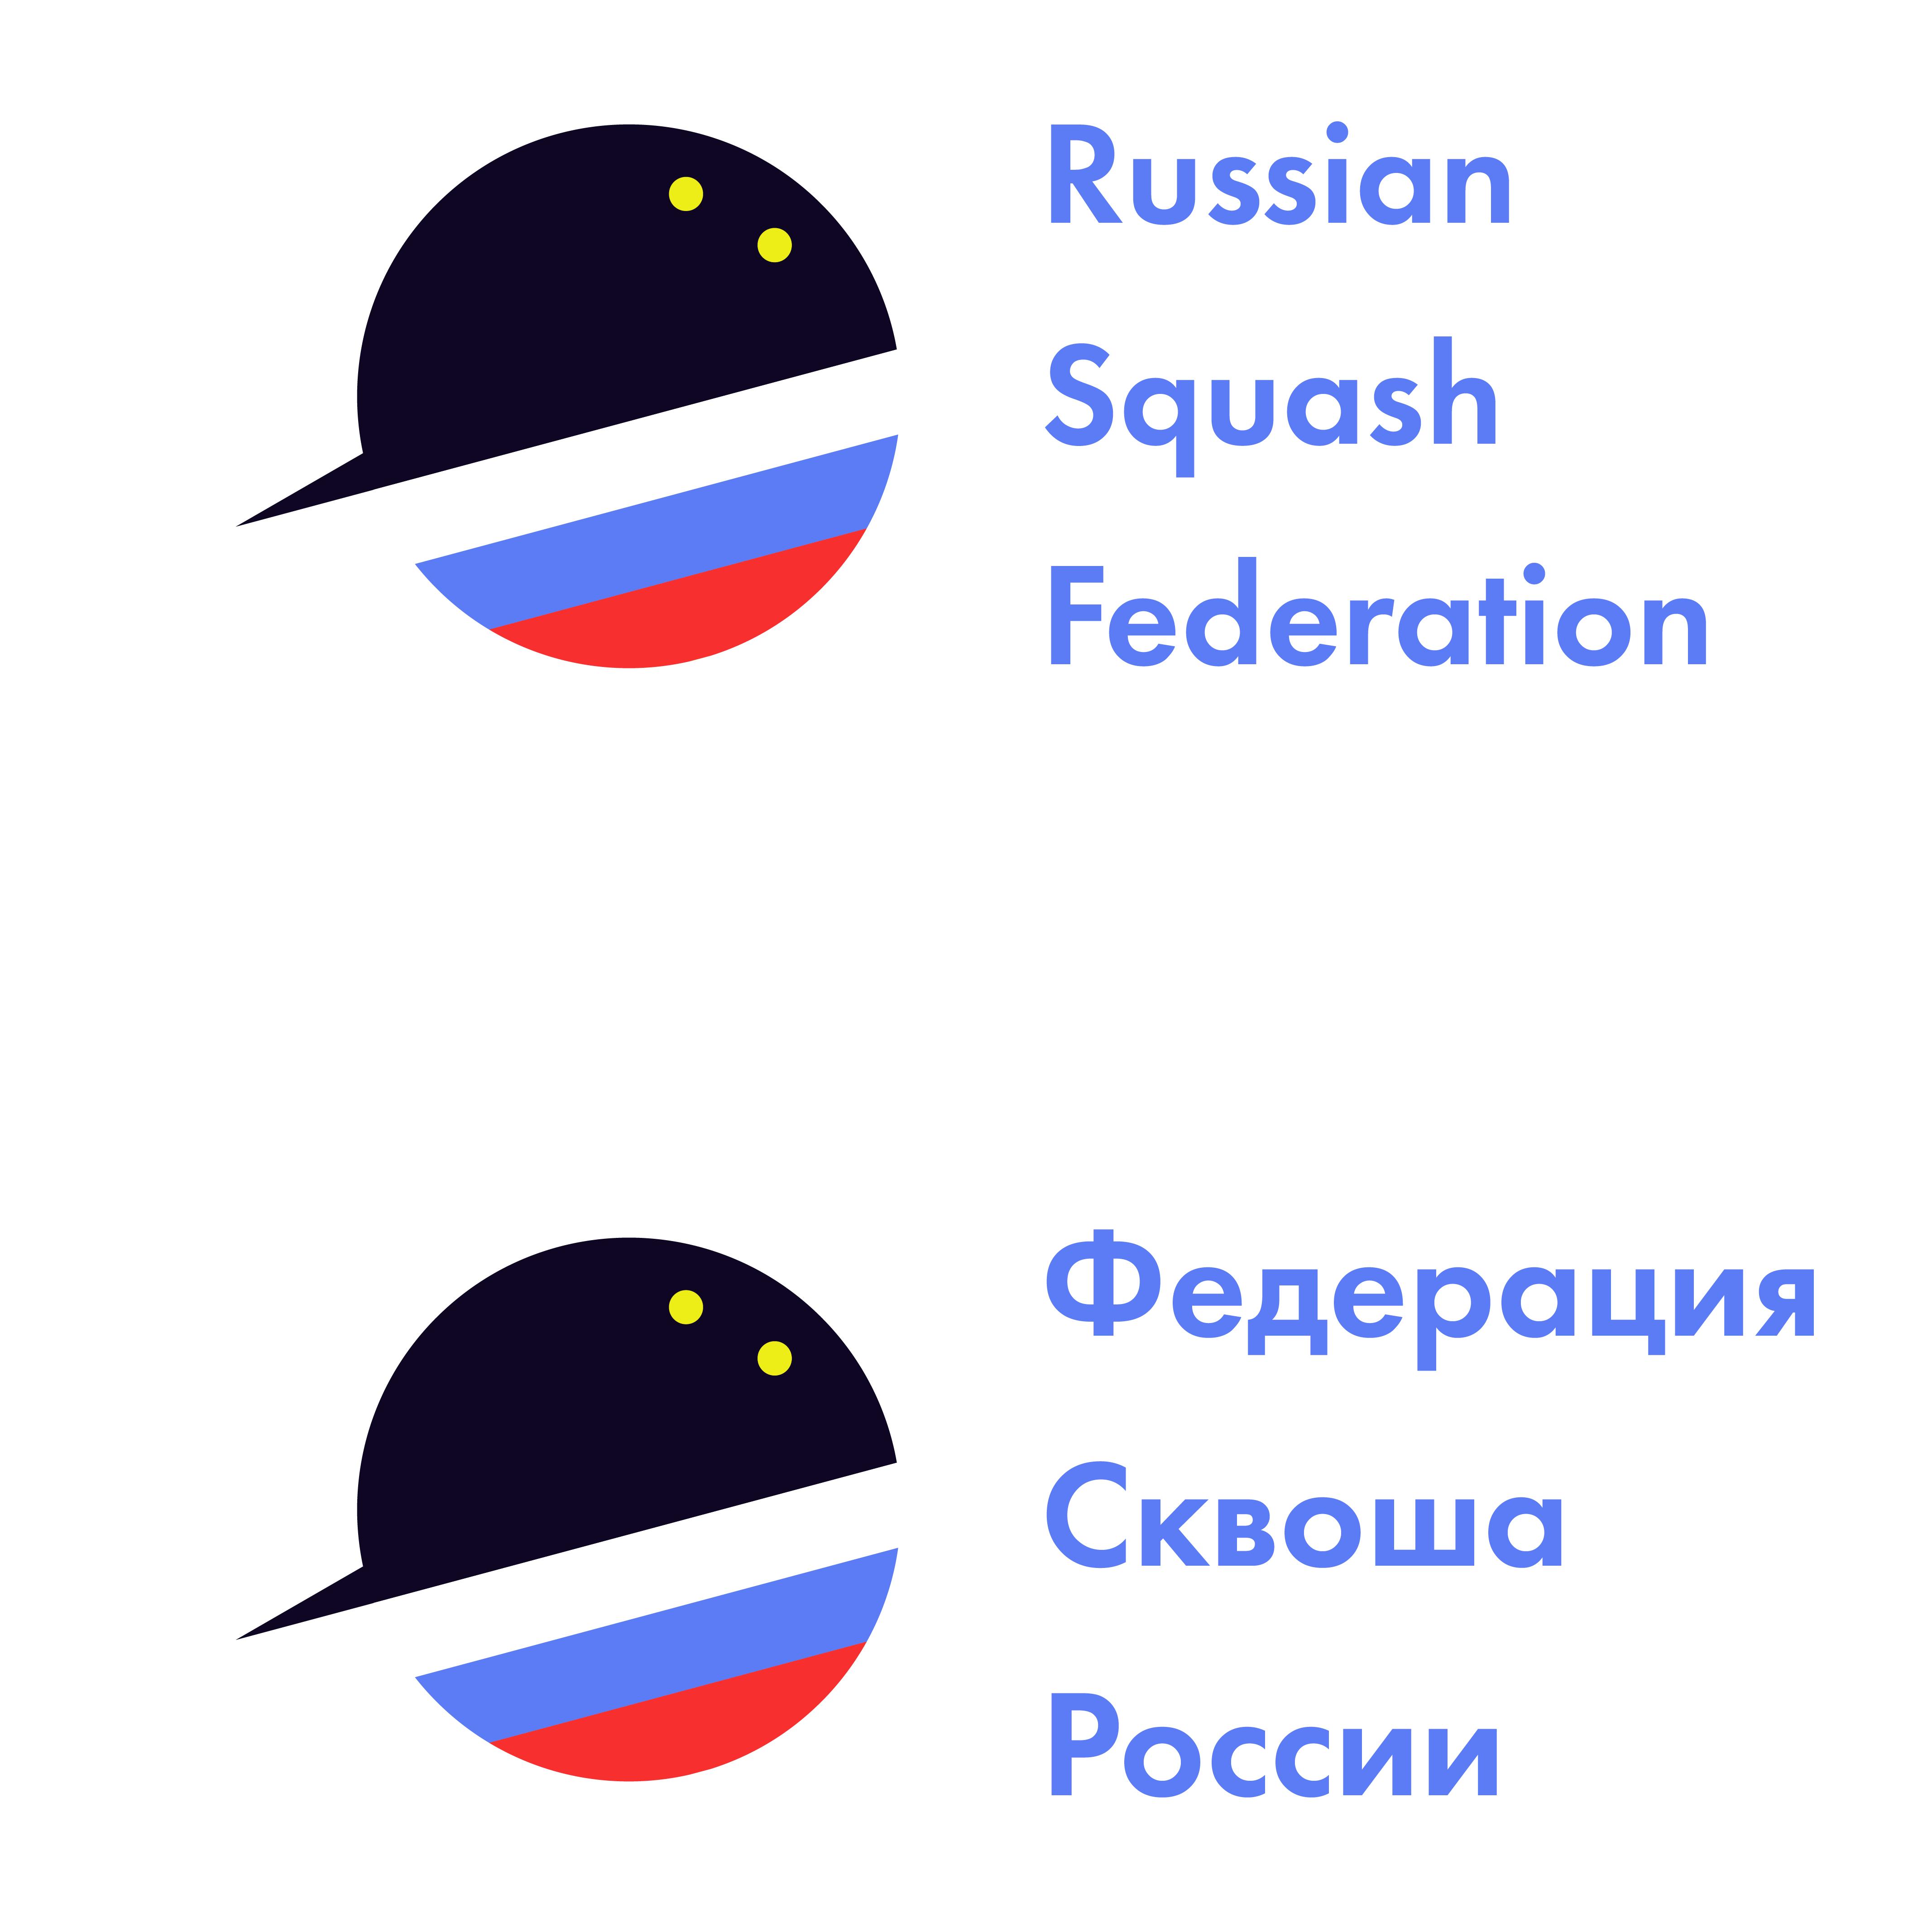 Разработать логотип для Федерации сквоша России фото f_9285f37d612d026f.png